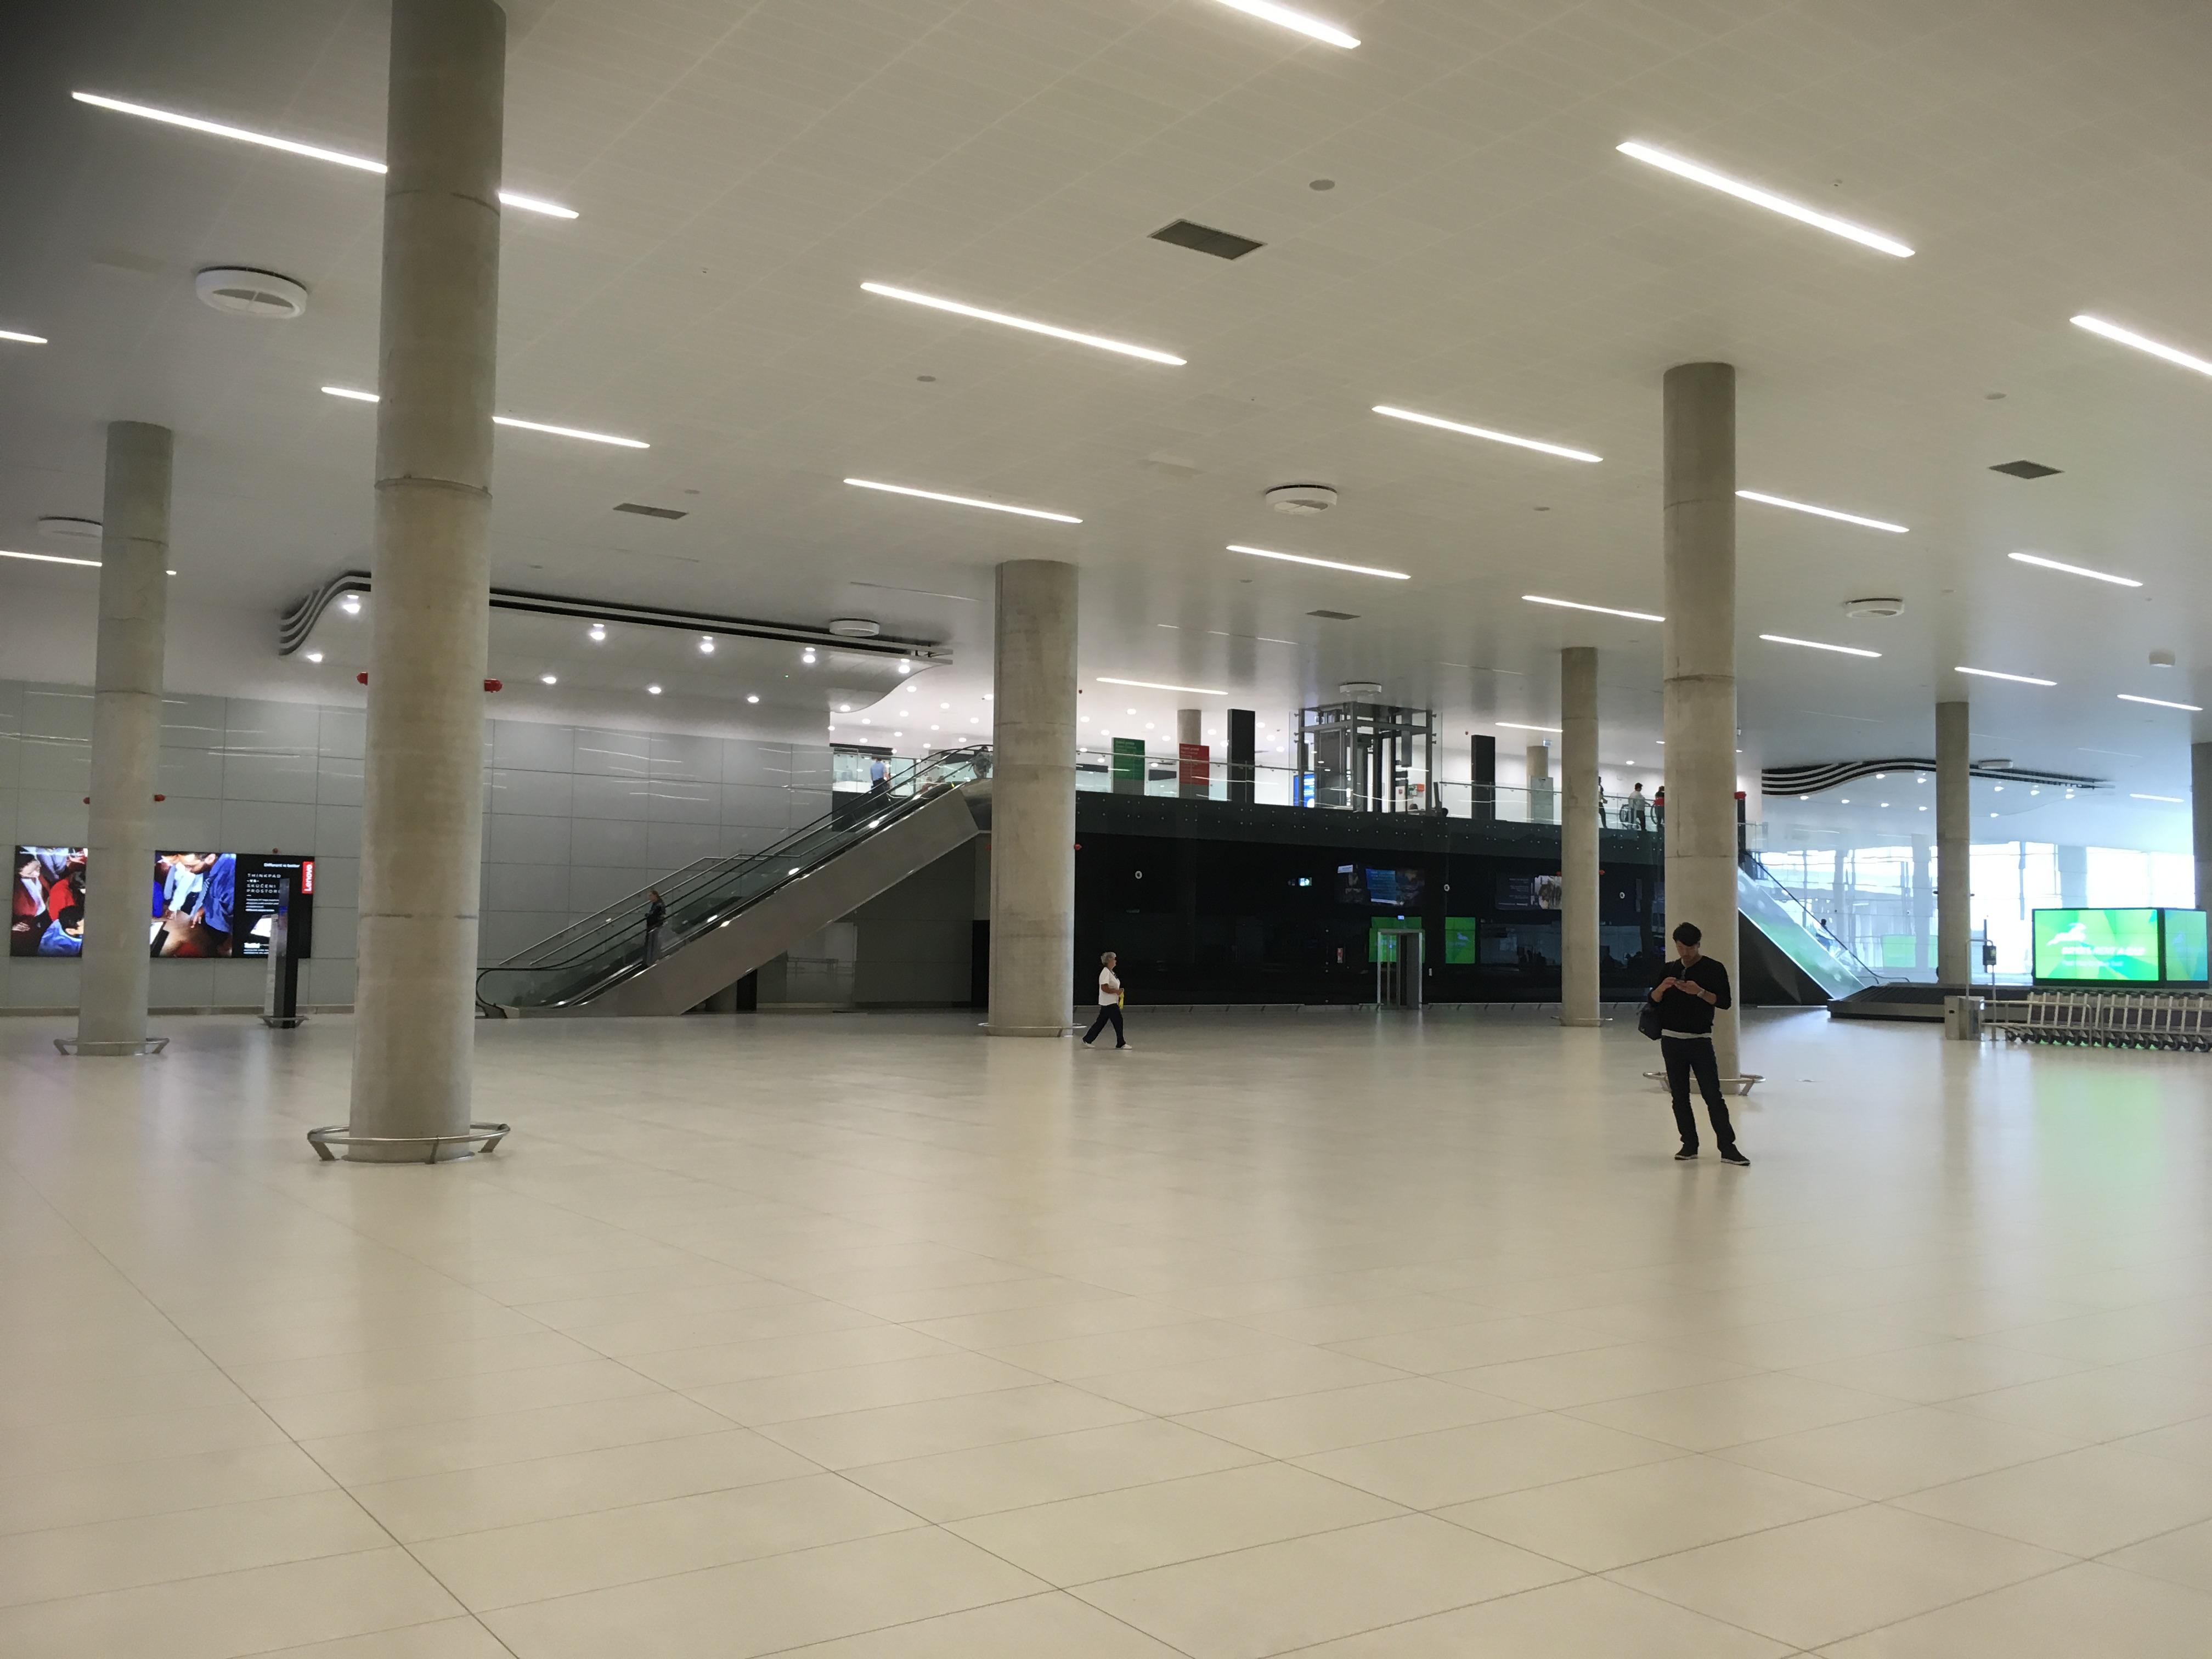 zagreb huge airport